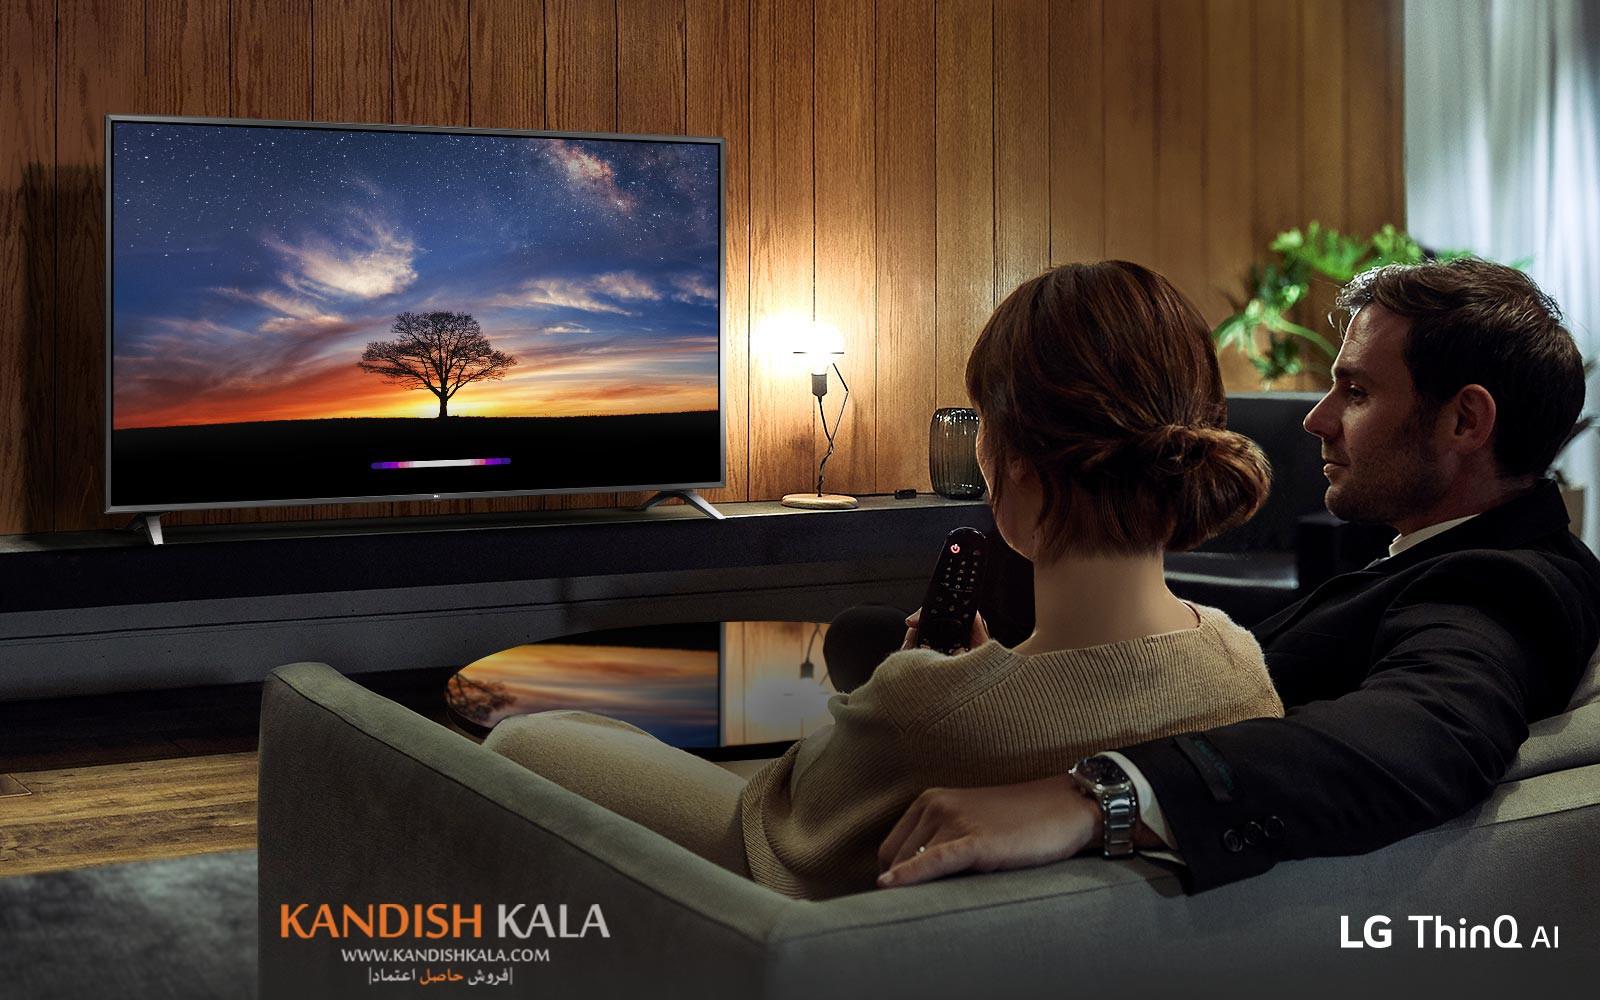 قیمت تلویزیون 70 اینچ ال جی مدل 70UM7350